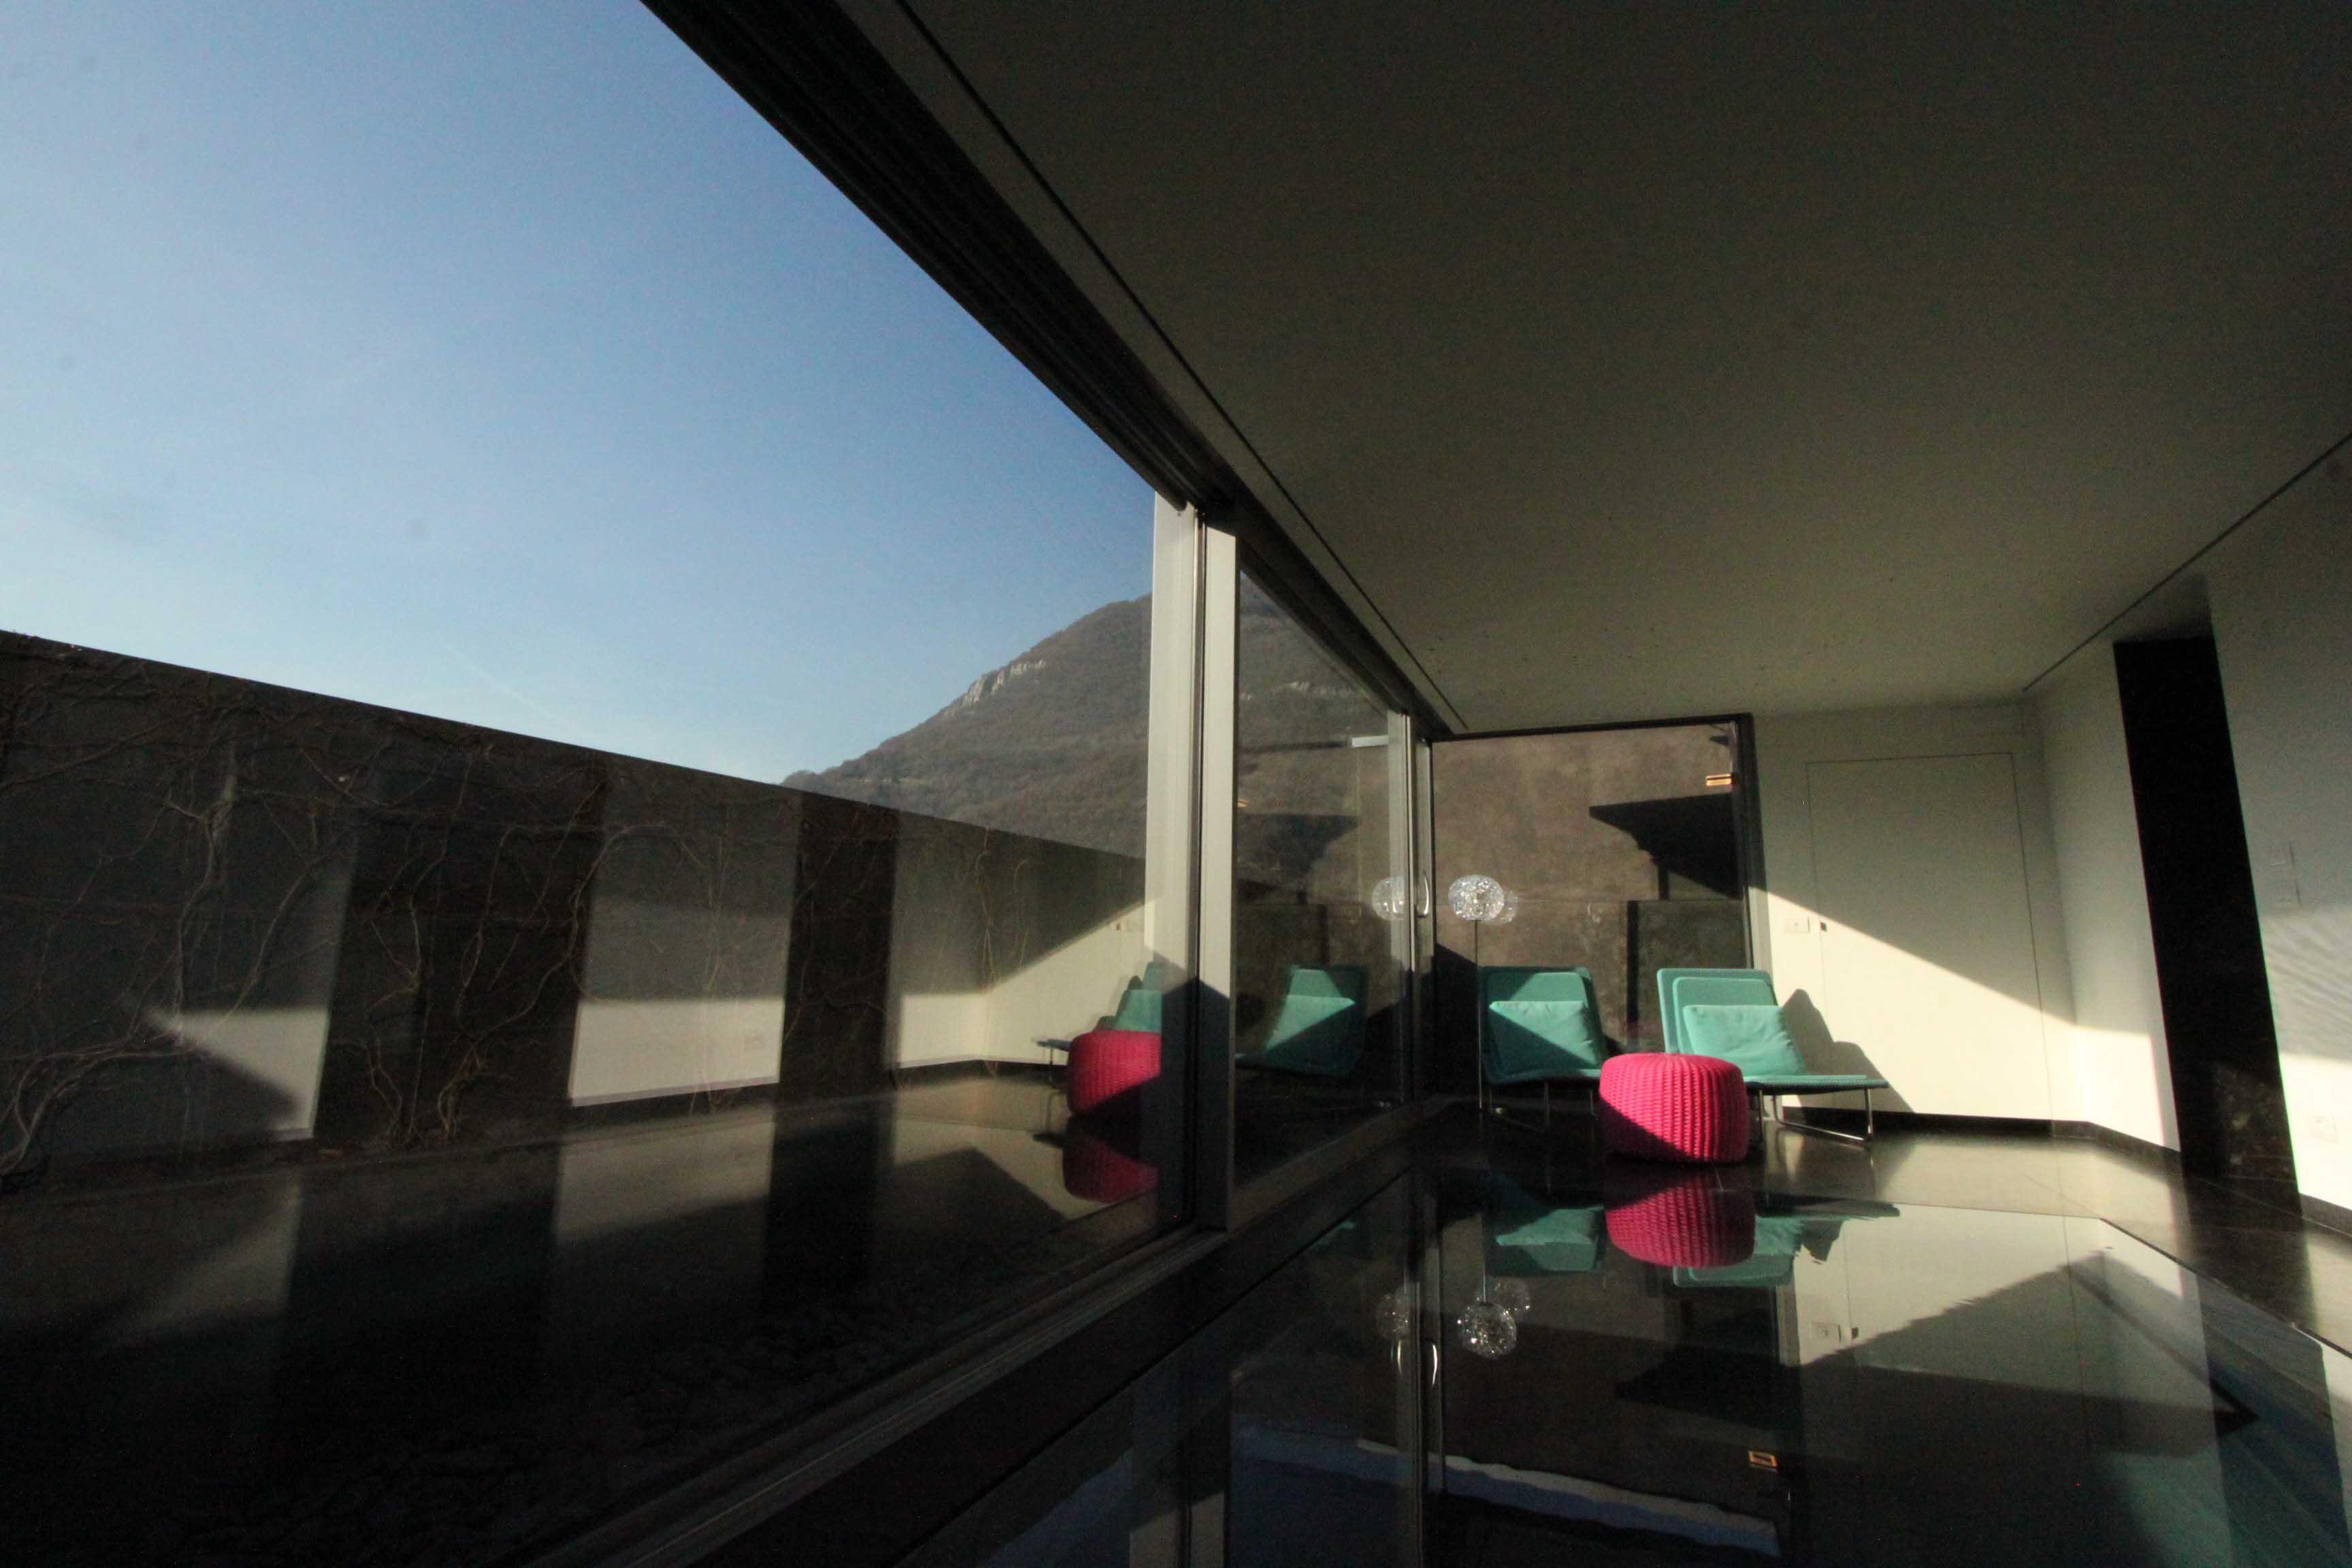 studio_balini_architettura_bergamo 15